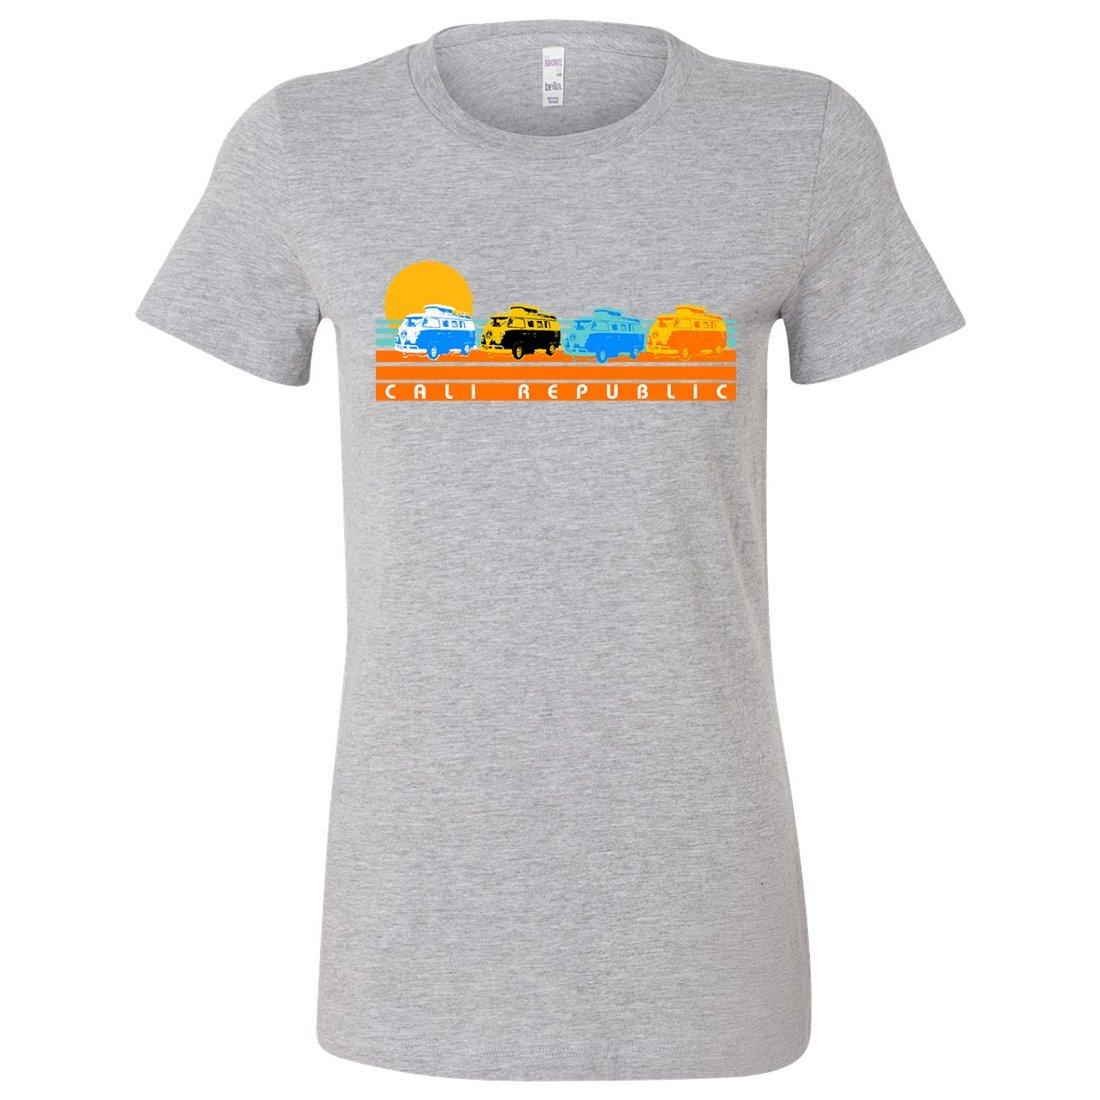 Cali Republic Vintage Van Sunset Lightweight Ted T-shirt